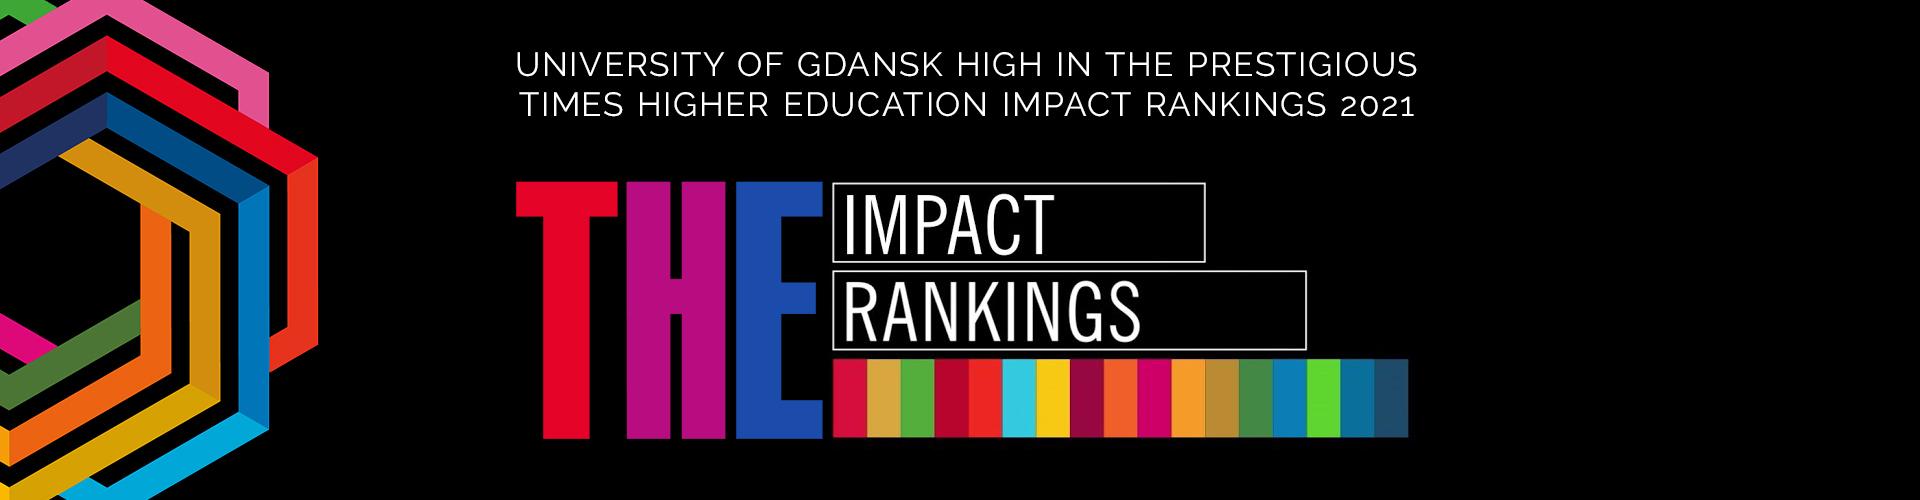 UNIVERSITY OF GDANSK HIGH IN THE PRESTIGIOUS TIMES HIGHER EDUCATION IMPACT RANKINGS 2021